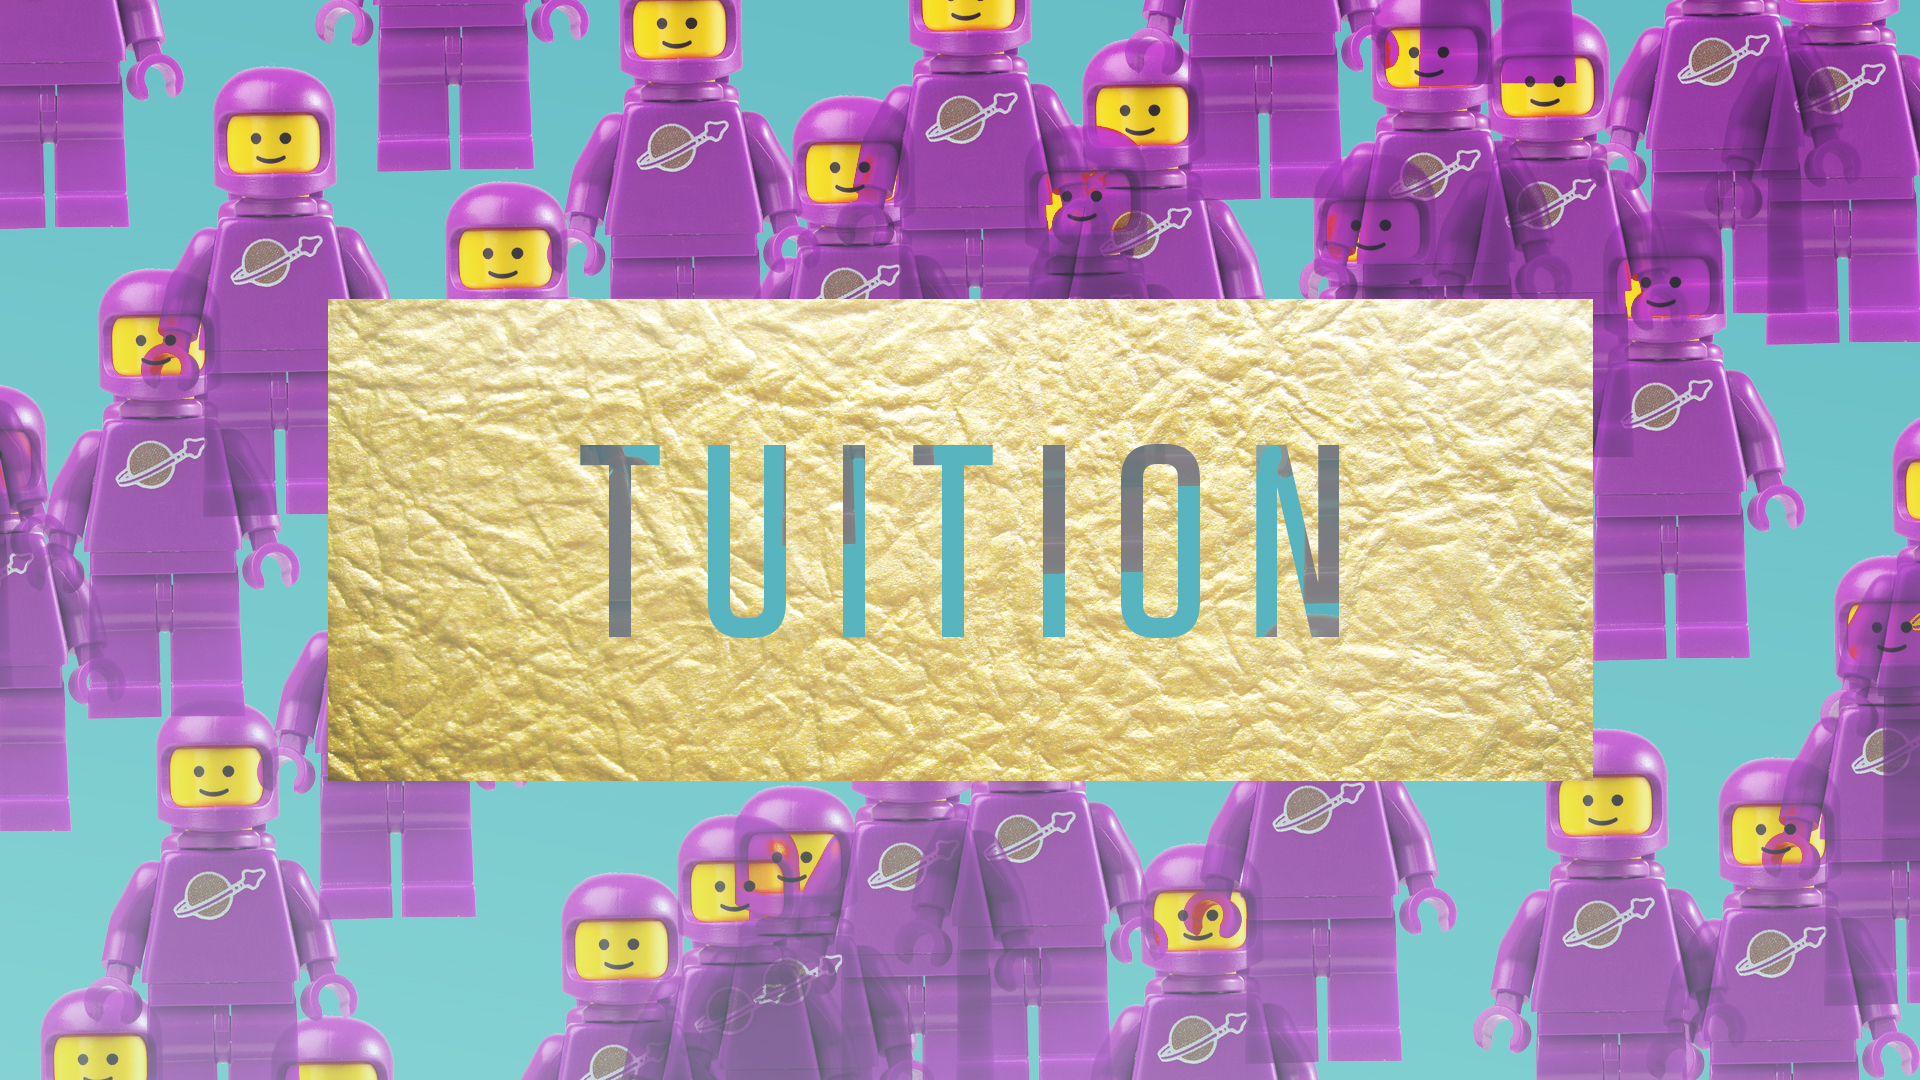 Tuition Image2.jpg